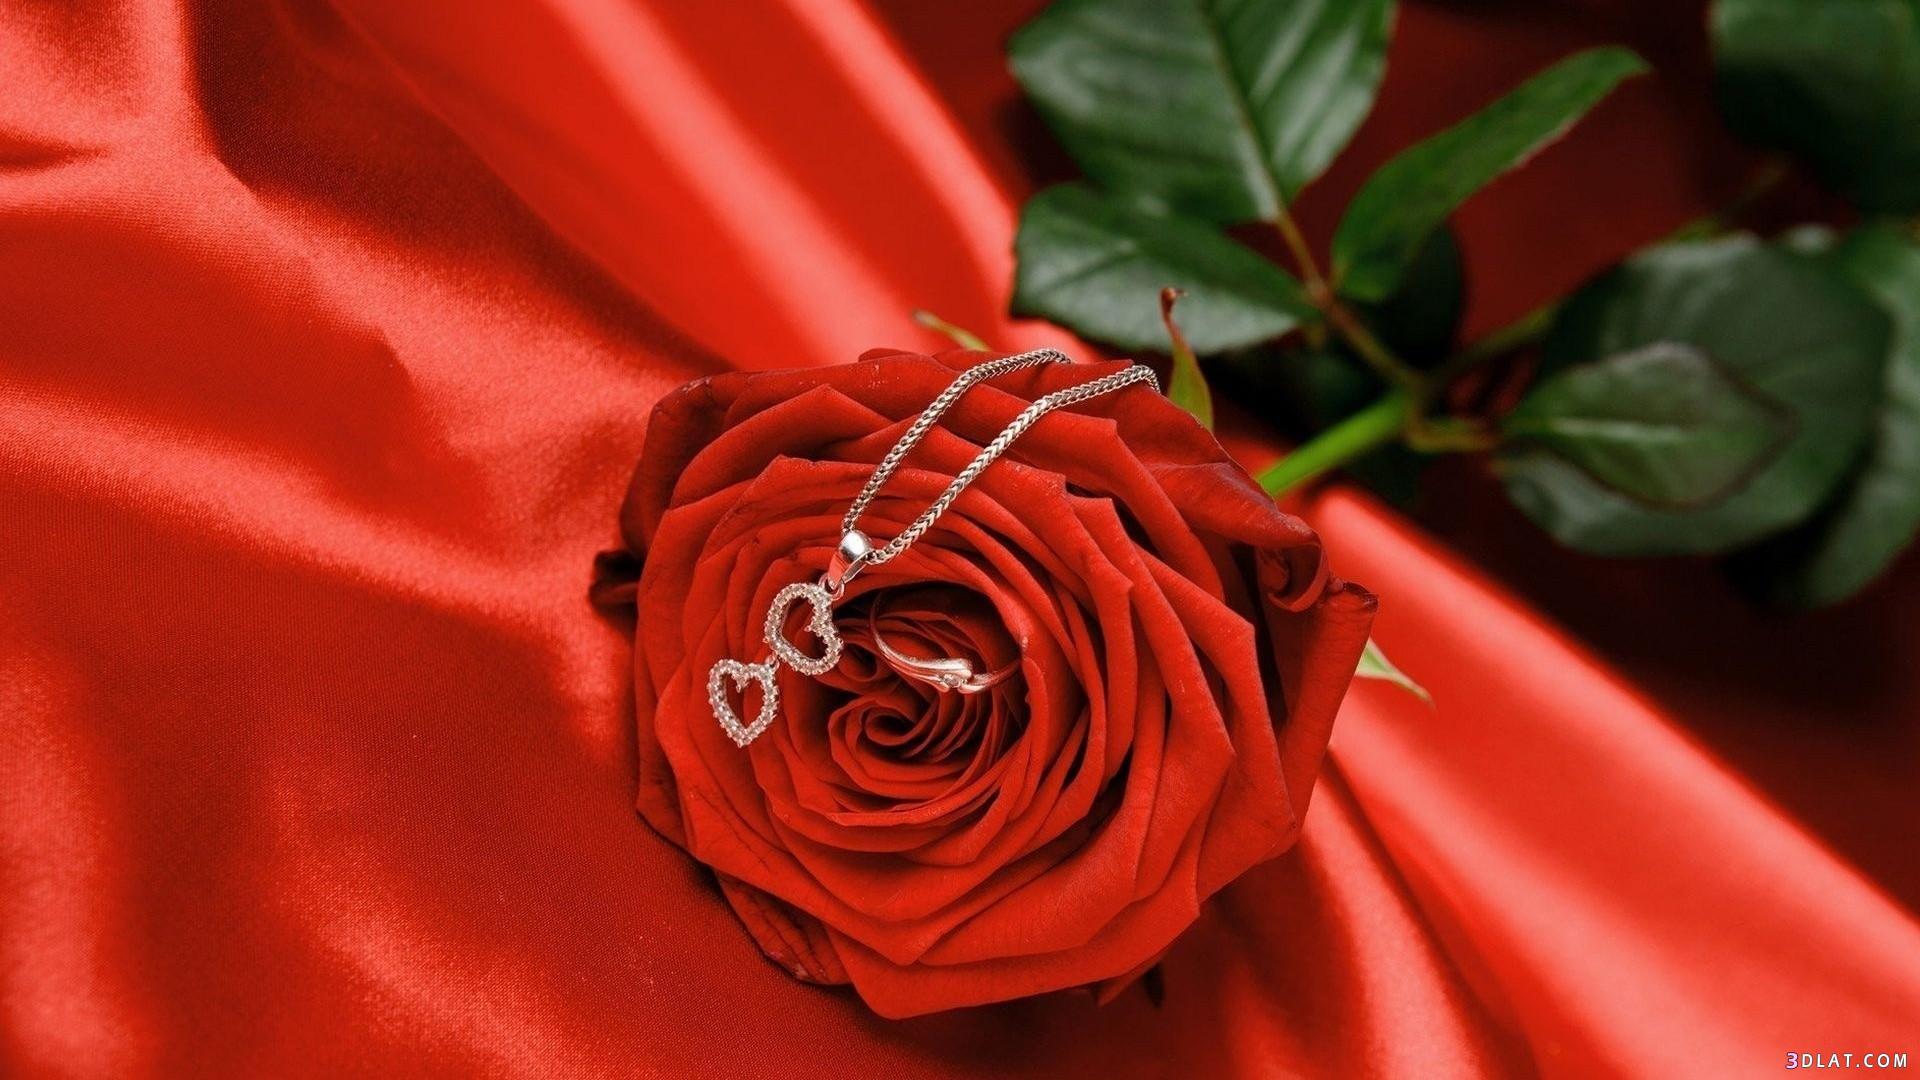 بالصور صور ورود جميلة , صور زهور جميله 3379 2